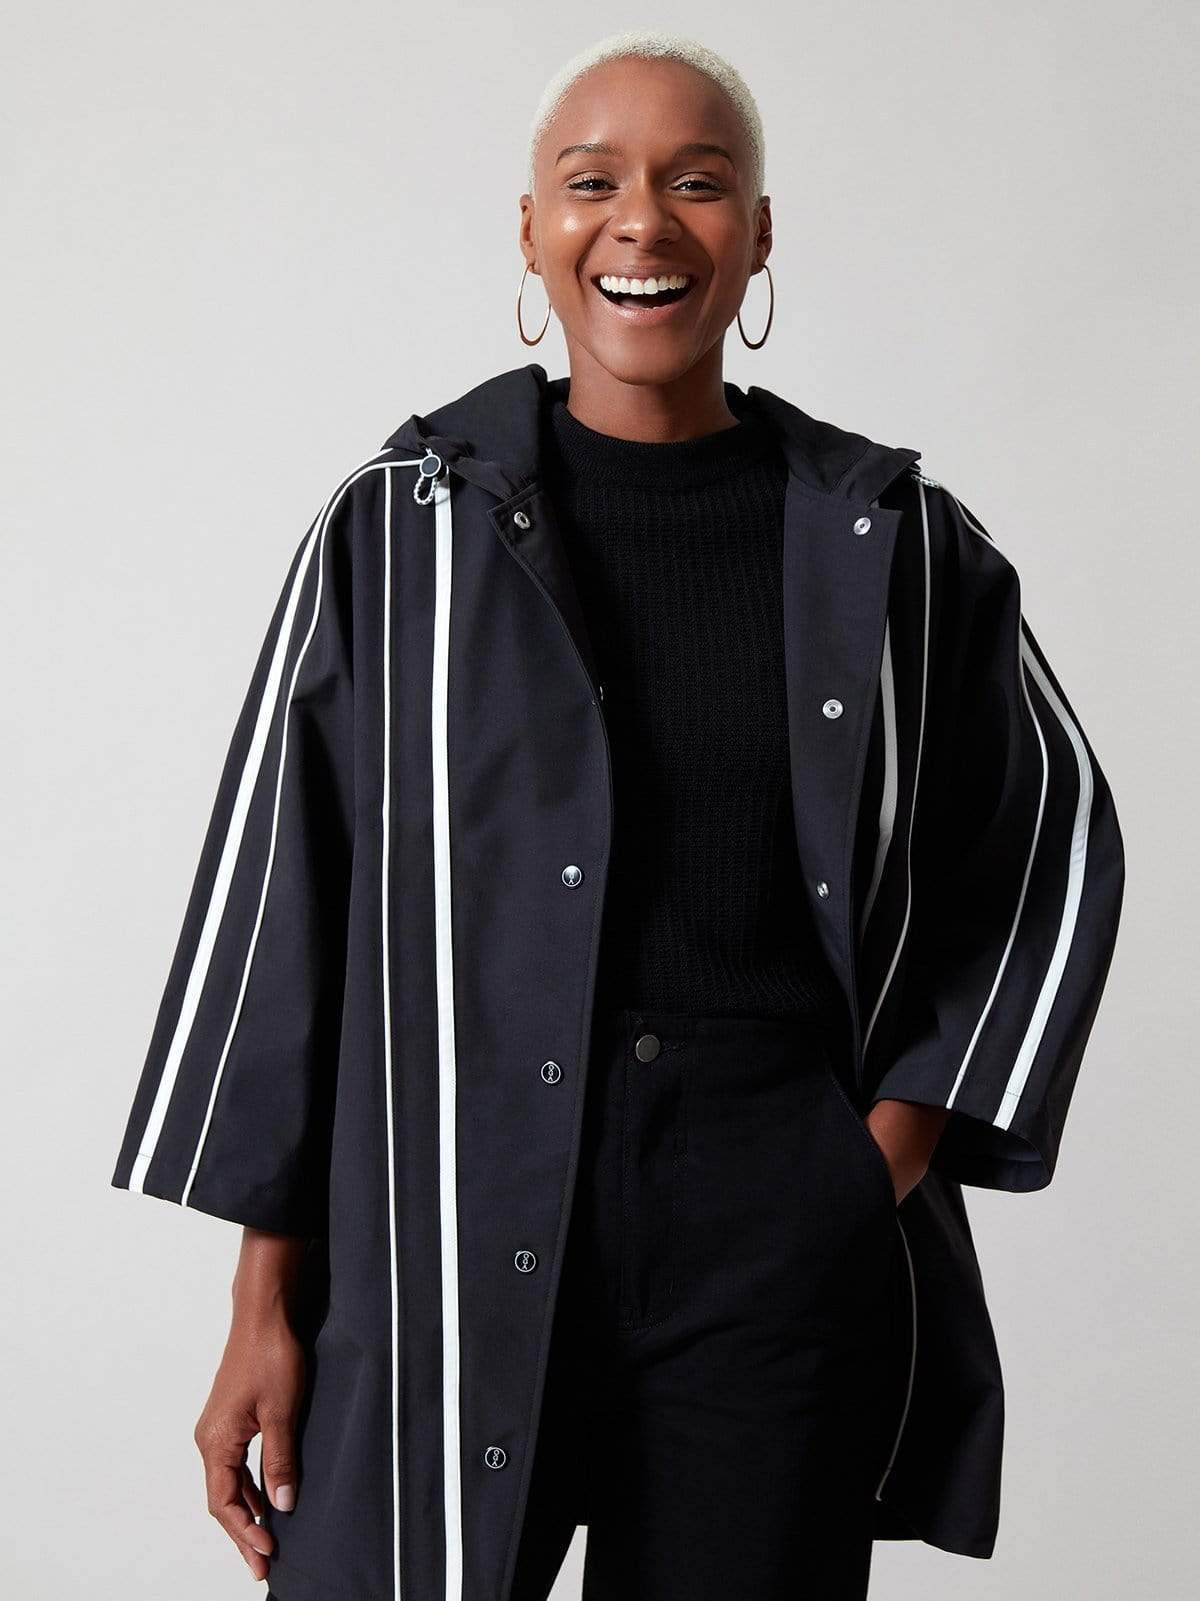 Waterproof Sustainable Greenlon® Recycled Yarn Raincoat